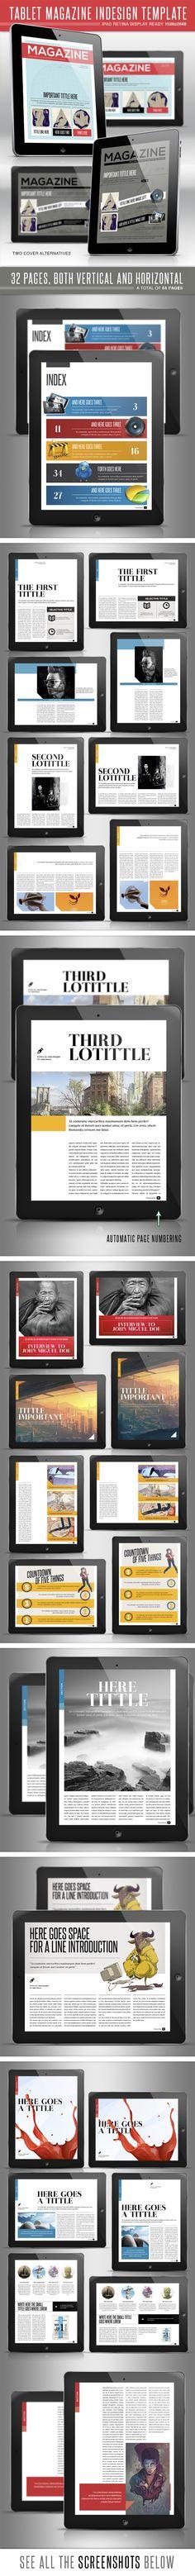 Tablet Magazine Design 2 by Lucas Iacono, via Behance